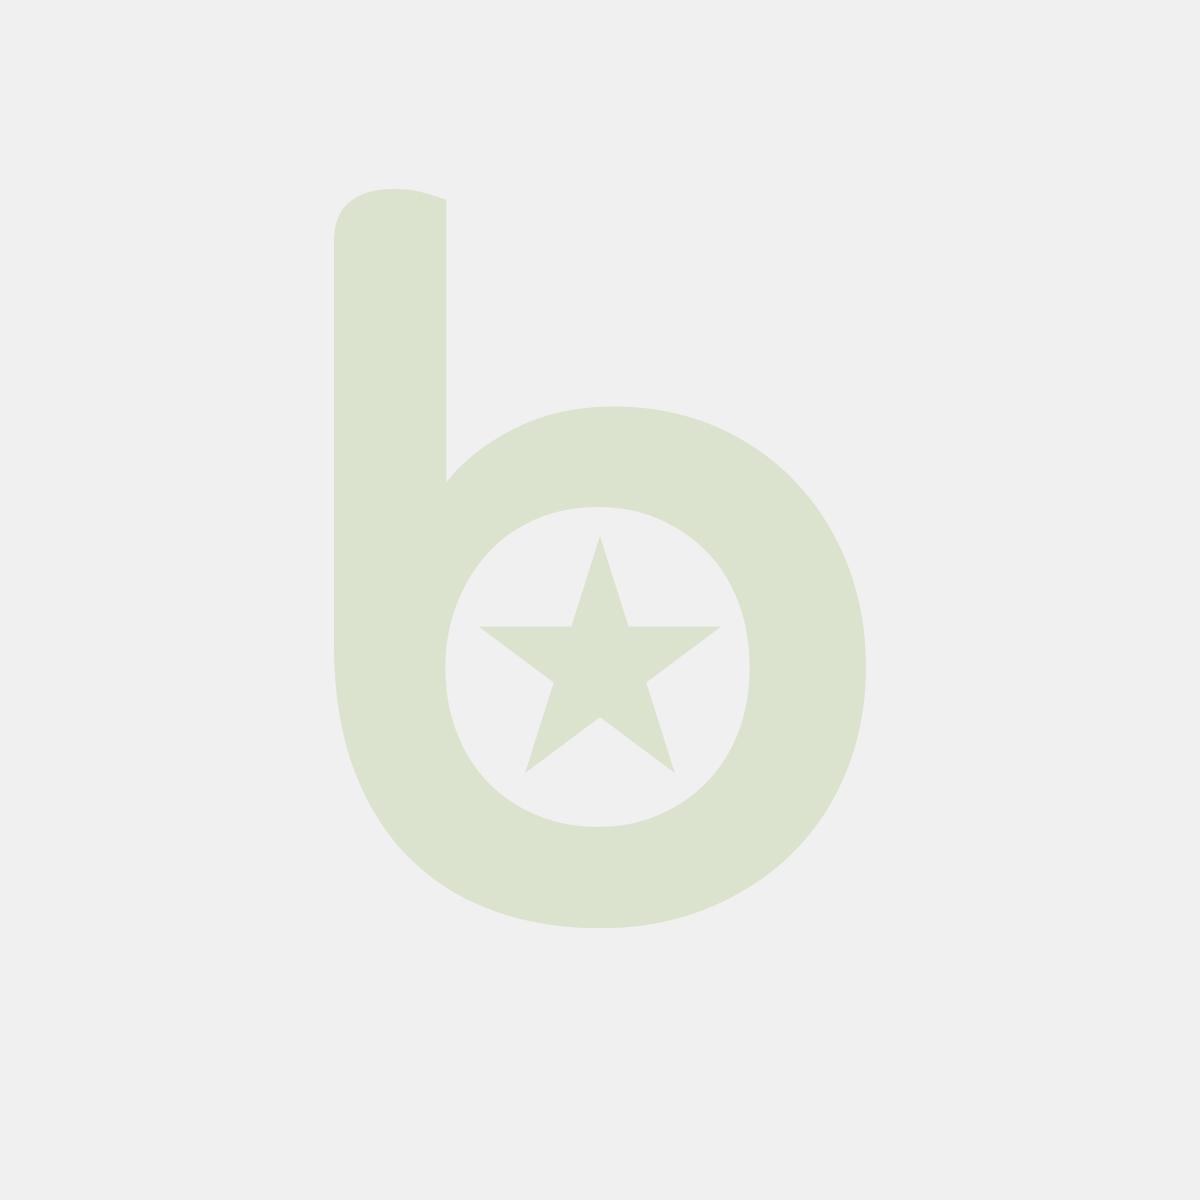 Schładzarka szokowa 3XGN 1/1 - kod 232163